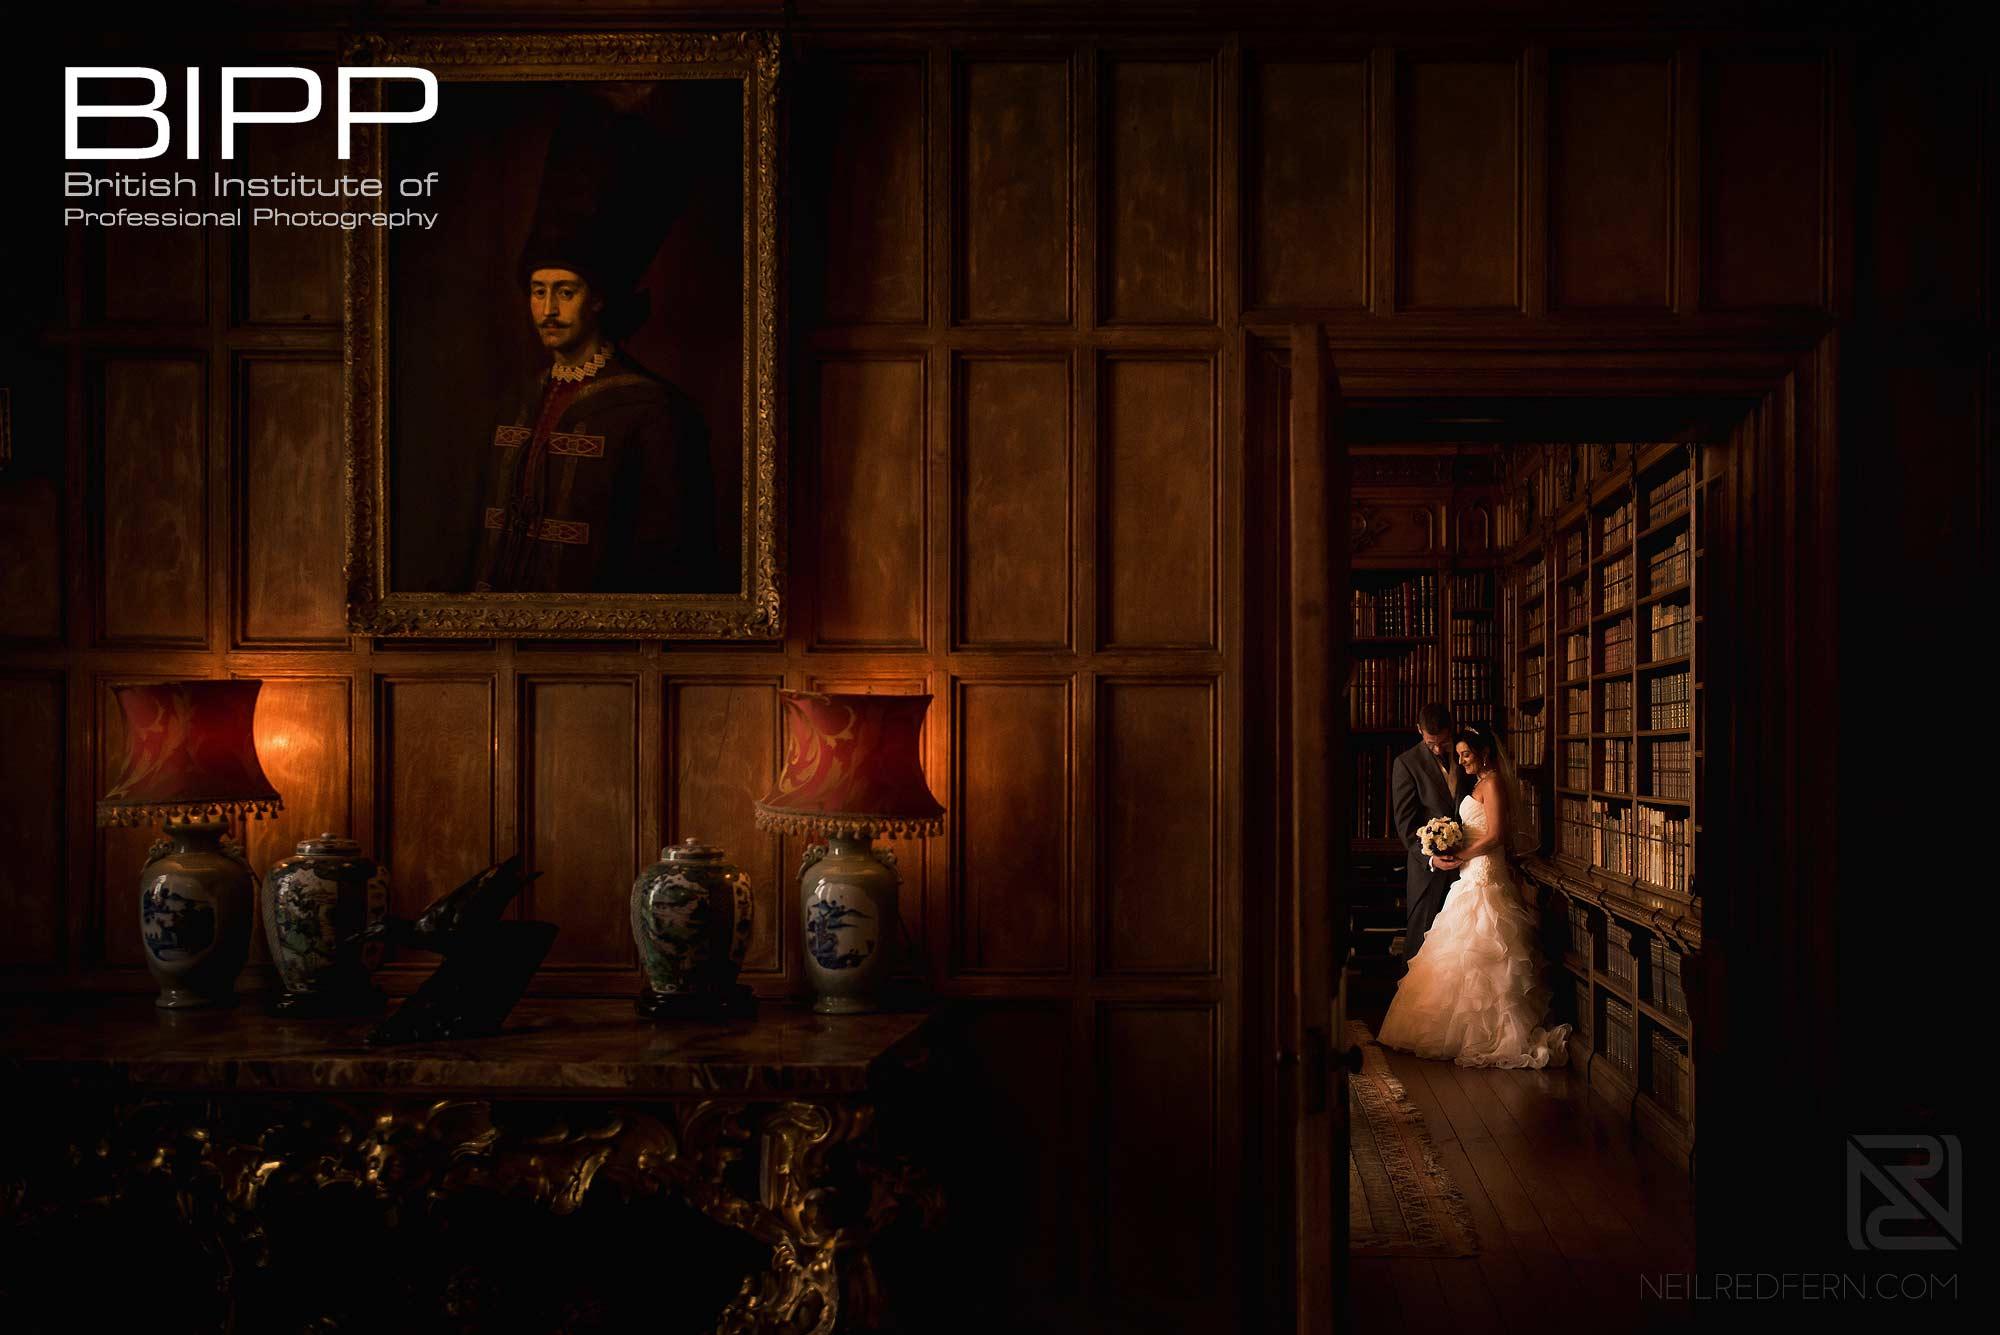 award winning wedding photograph taken in Arley Hall